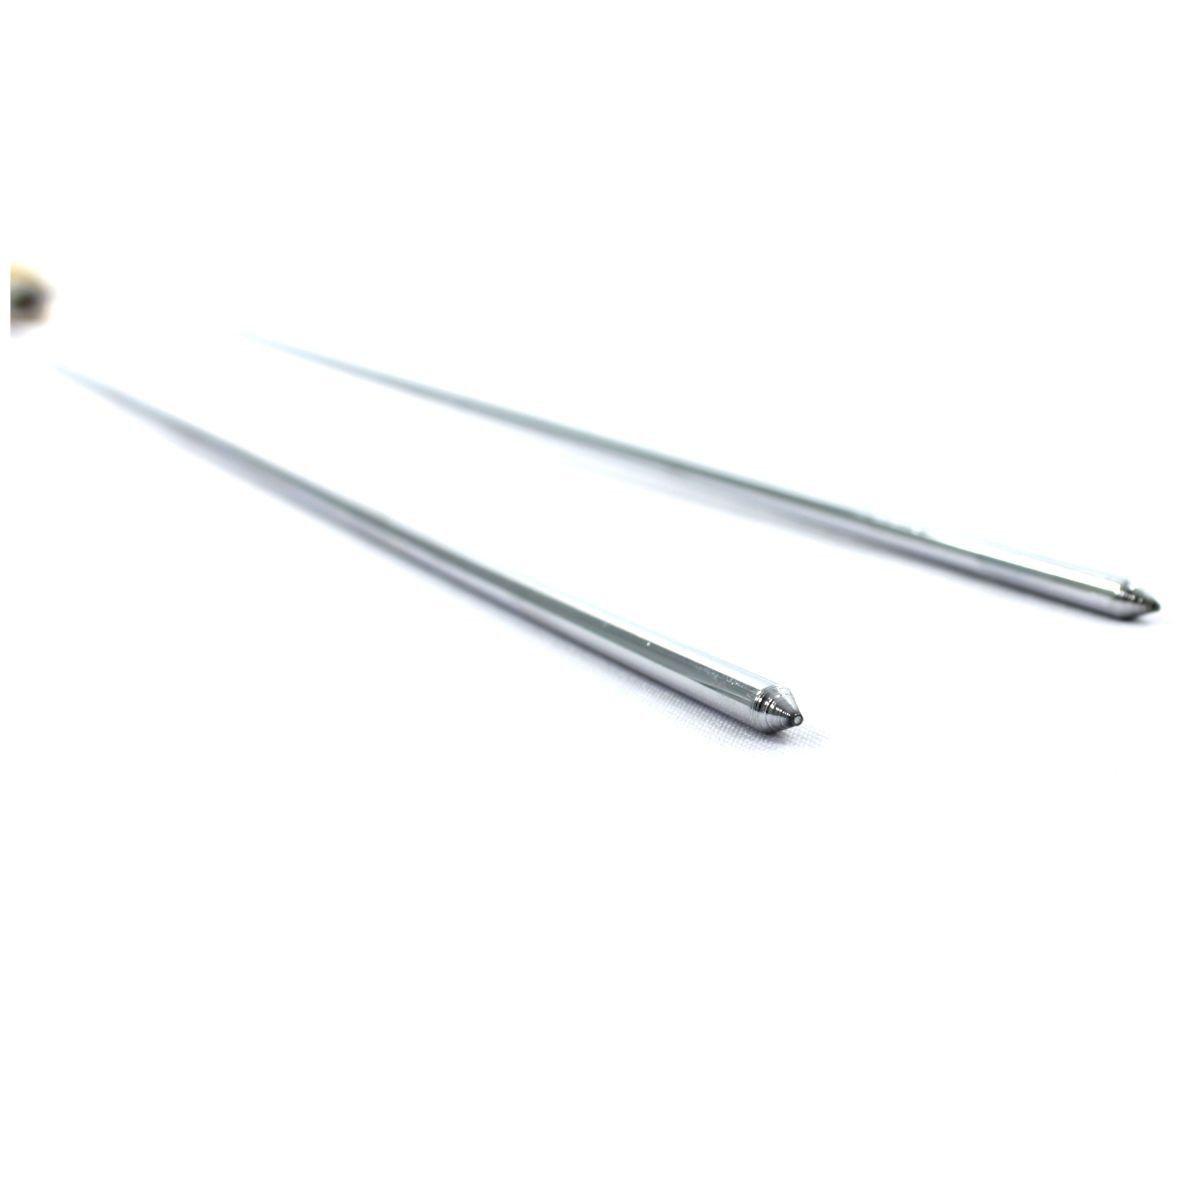 Kit 10 Espetos Duplos Churrasco Aperitivos 85cm - Aço Cromado